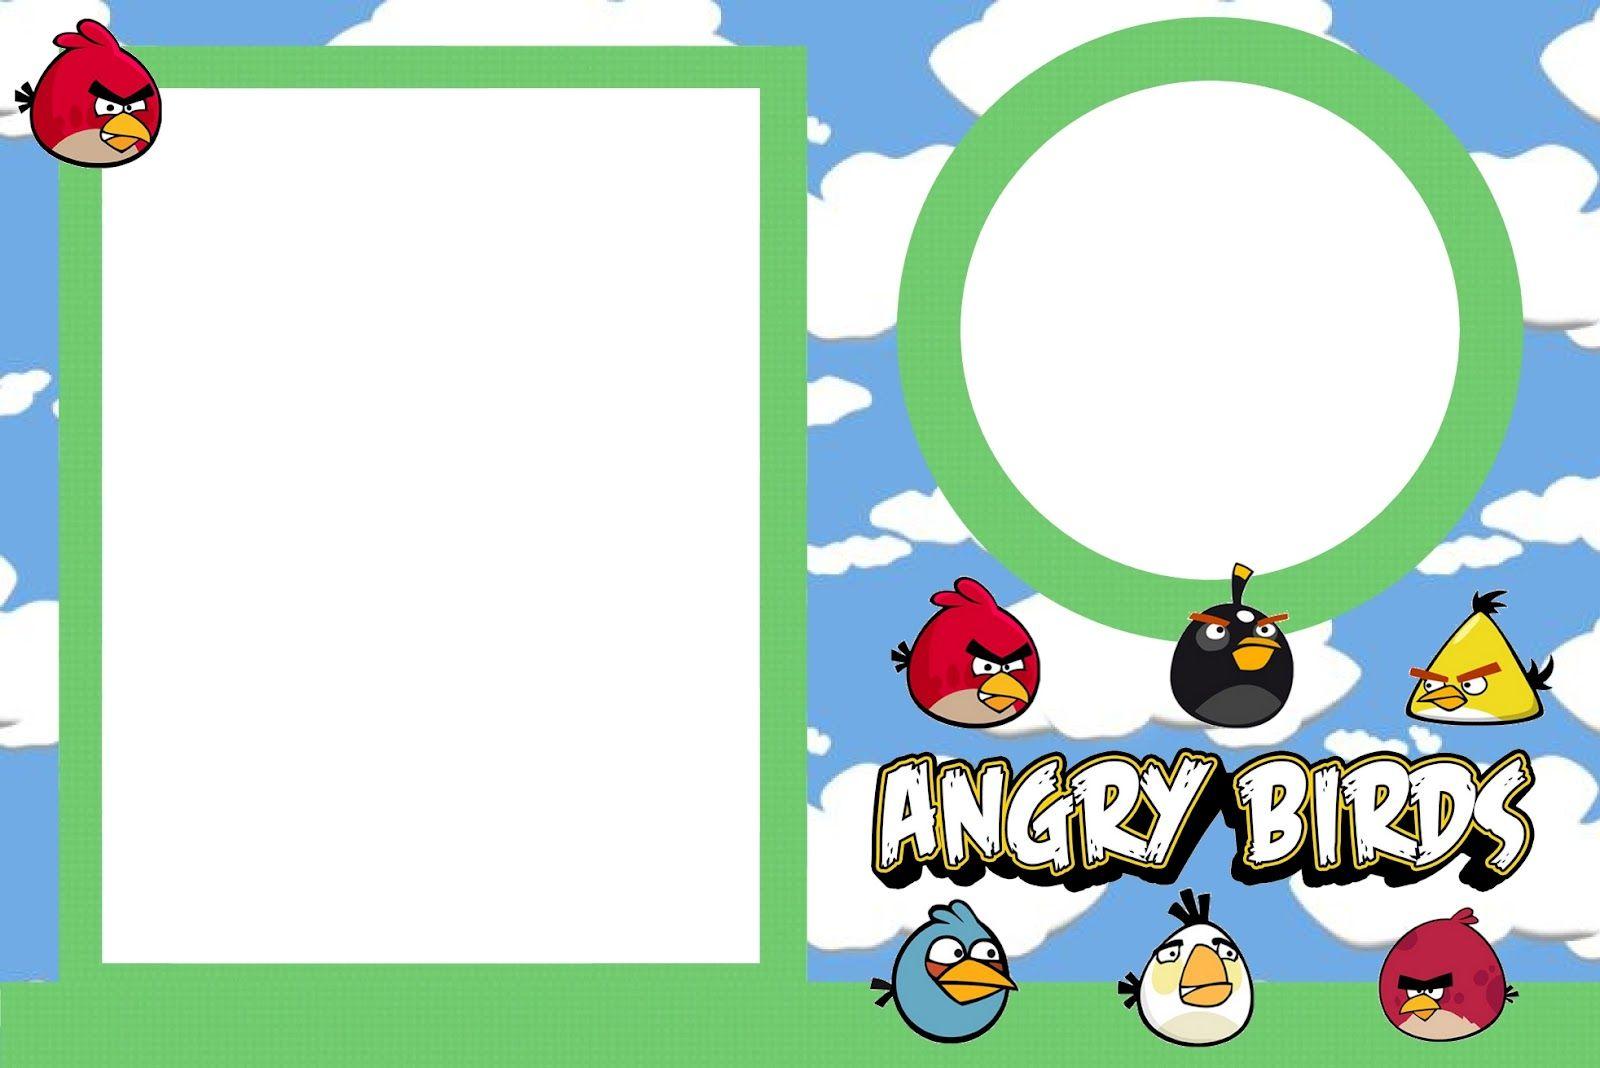 Angry Birds - Kit Completo com molduras para convites, rótulos ...